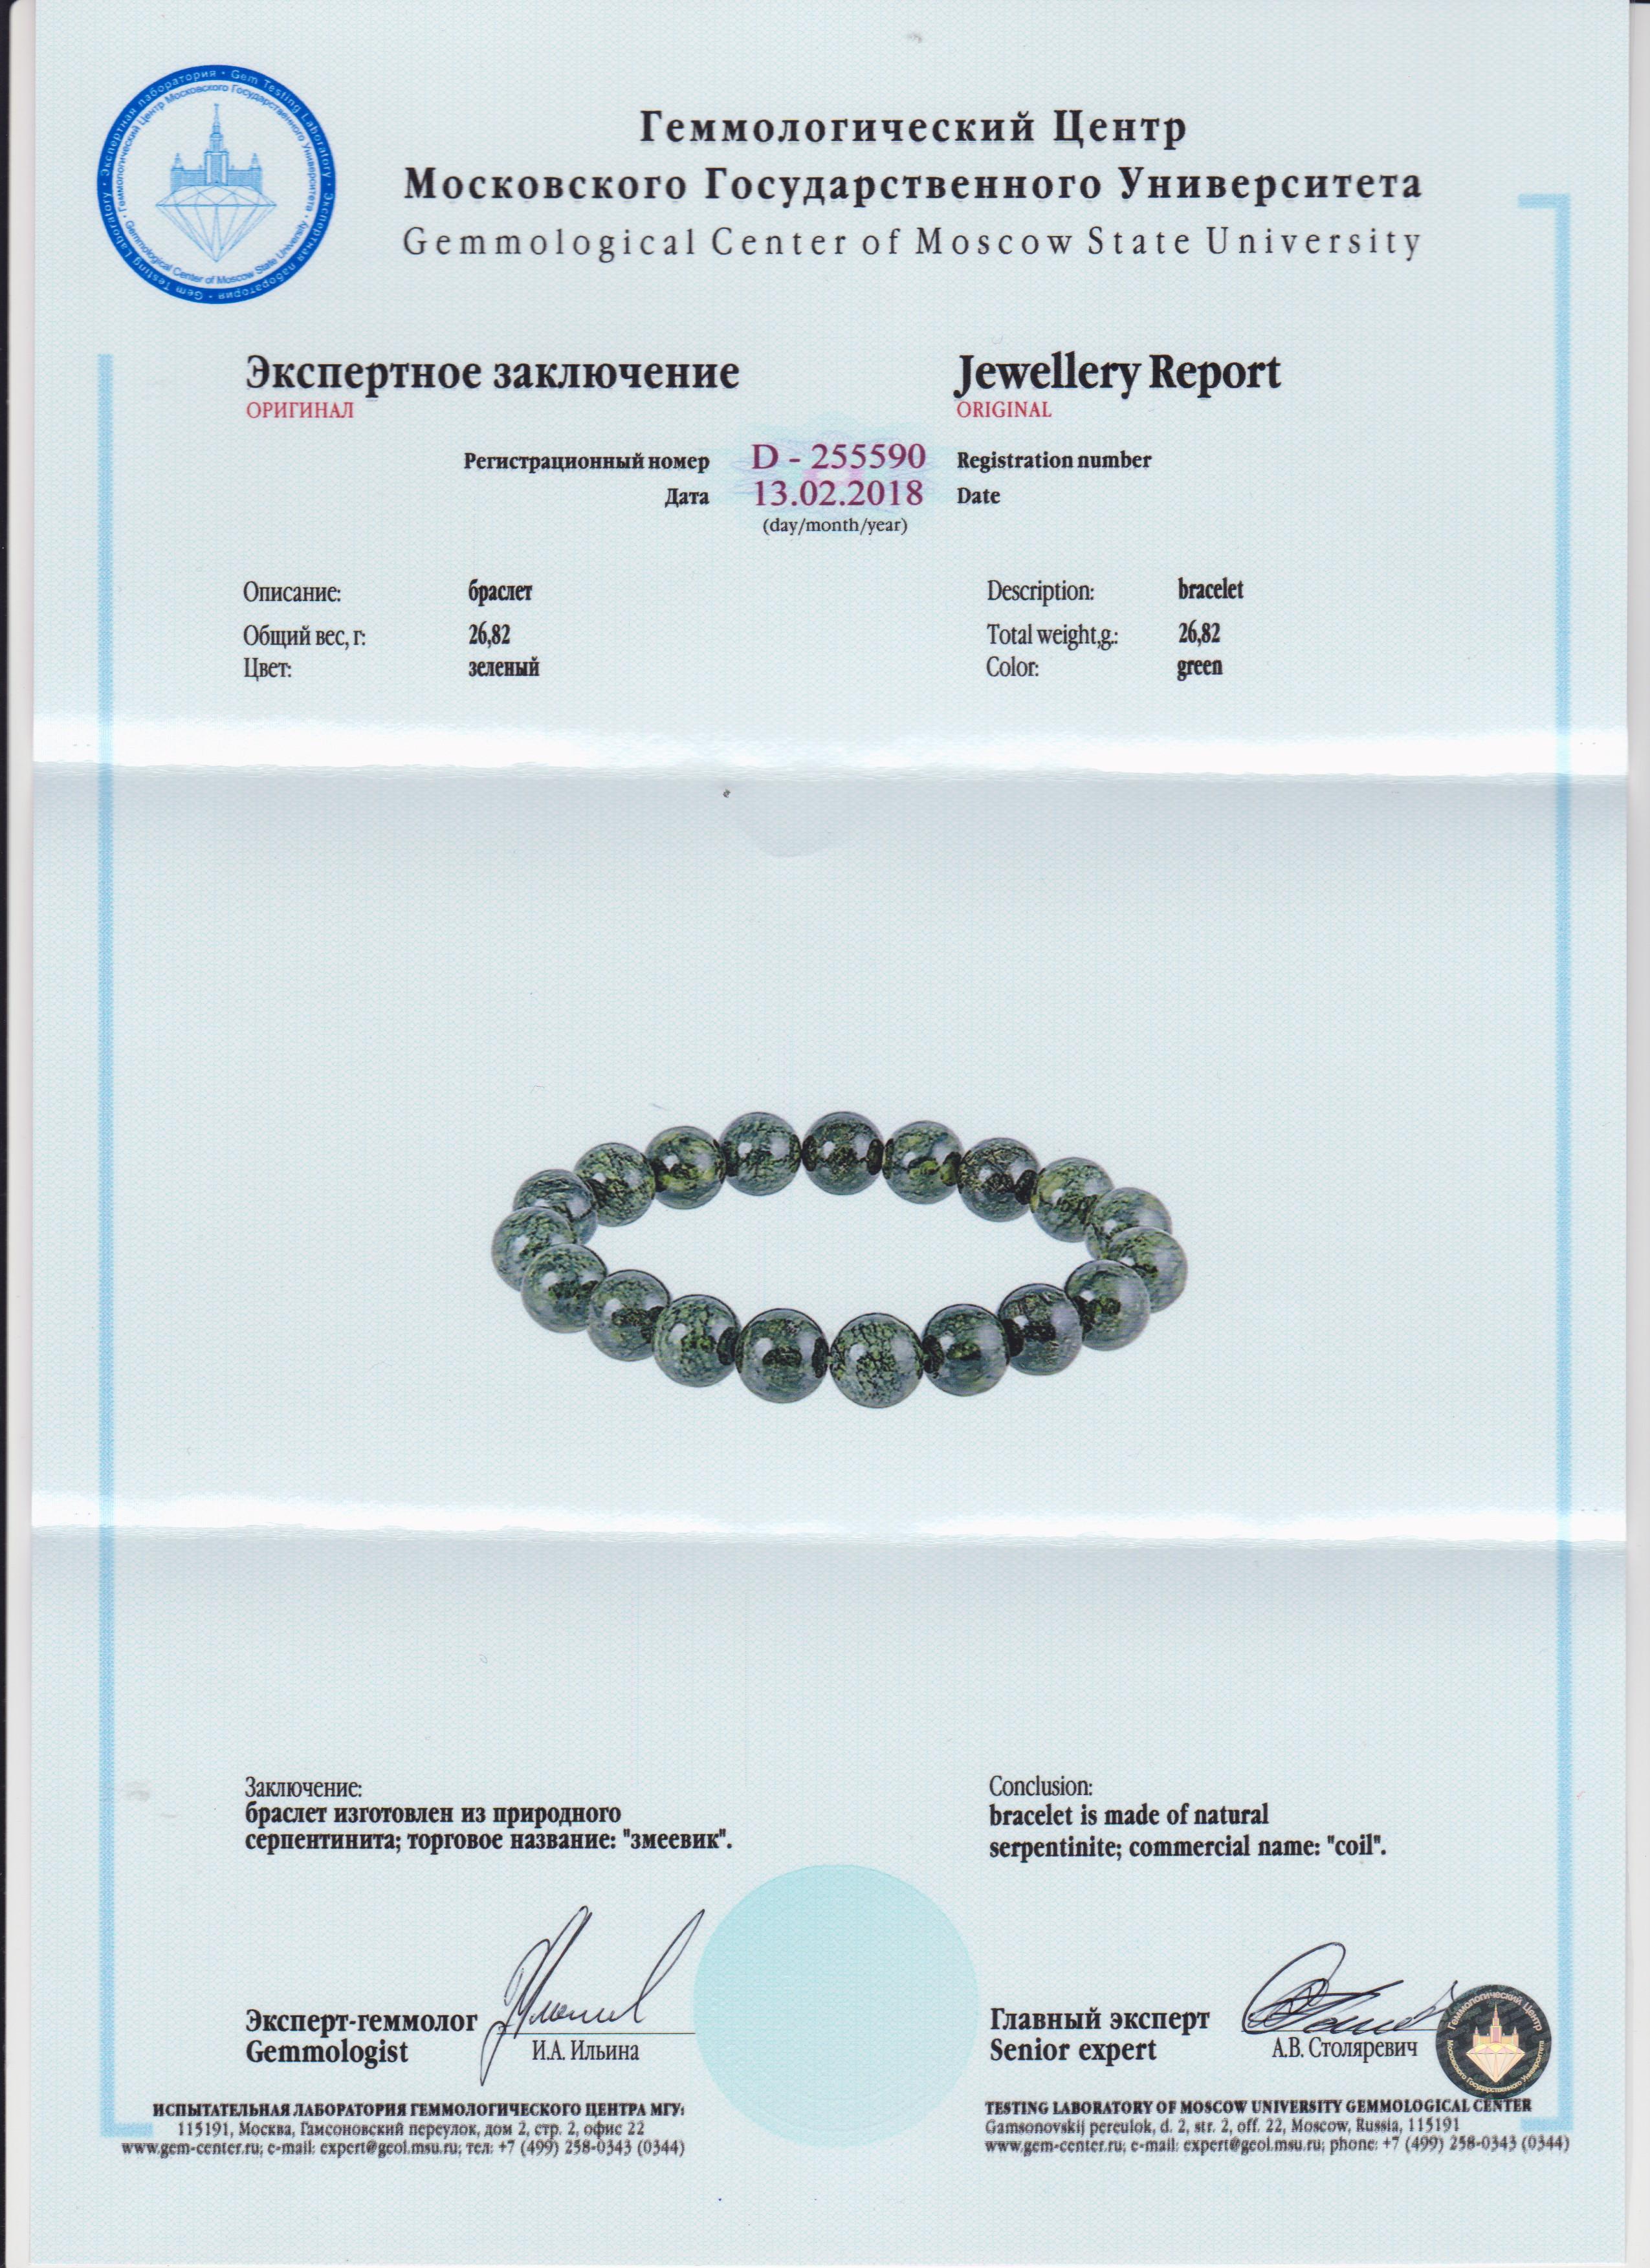 https://mineralmarket.ru/img/certificate/51/1520249239.jpg